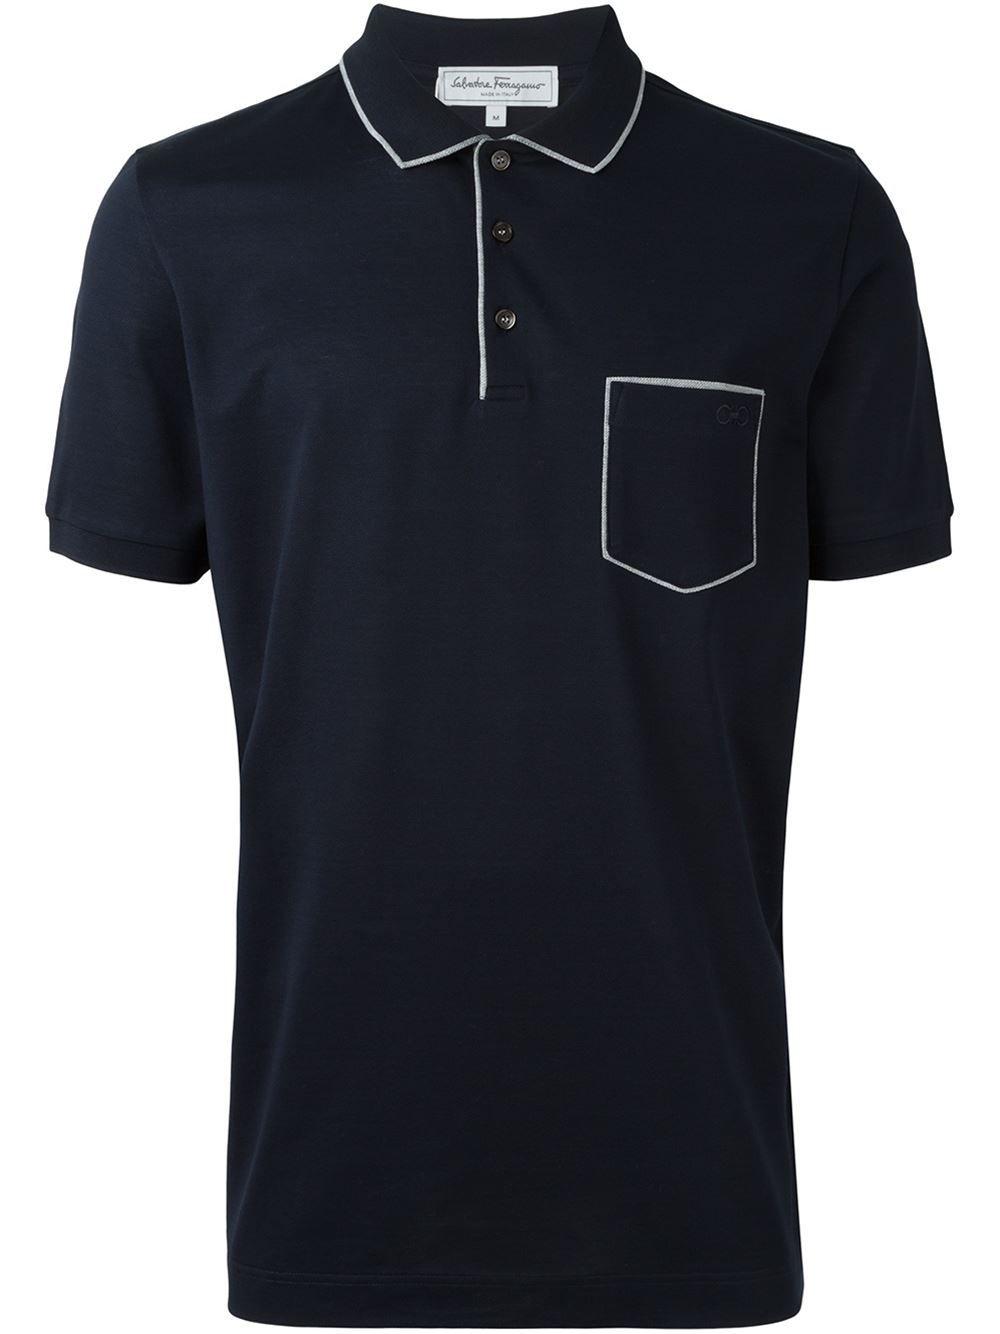 5dbd0cfed Salvatore Ferragamo Camisa polo com bolso